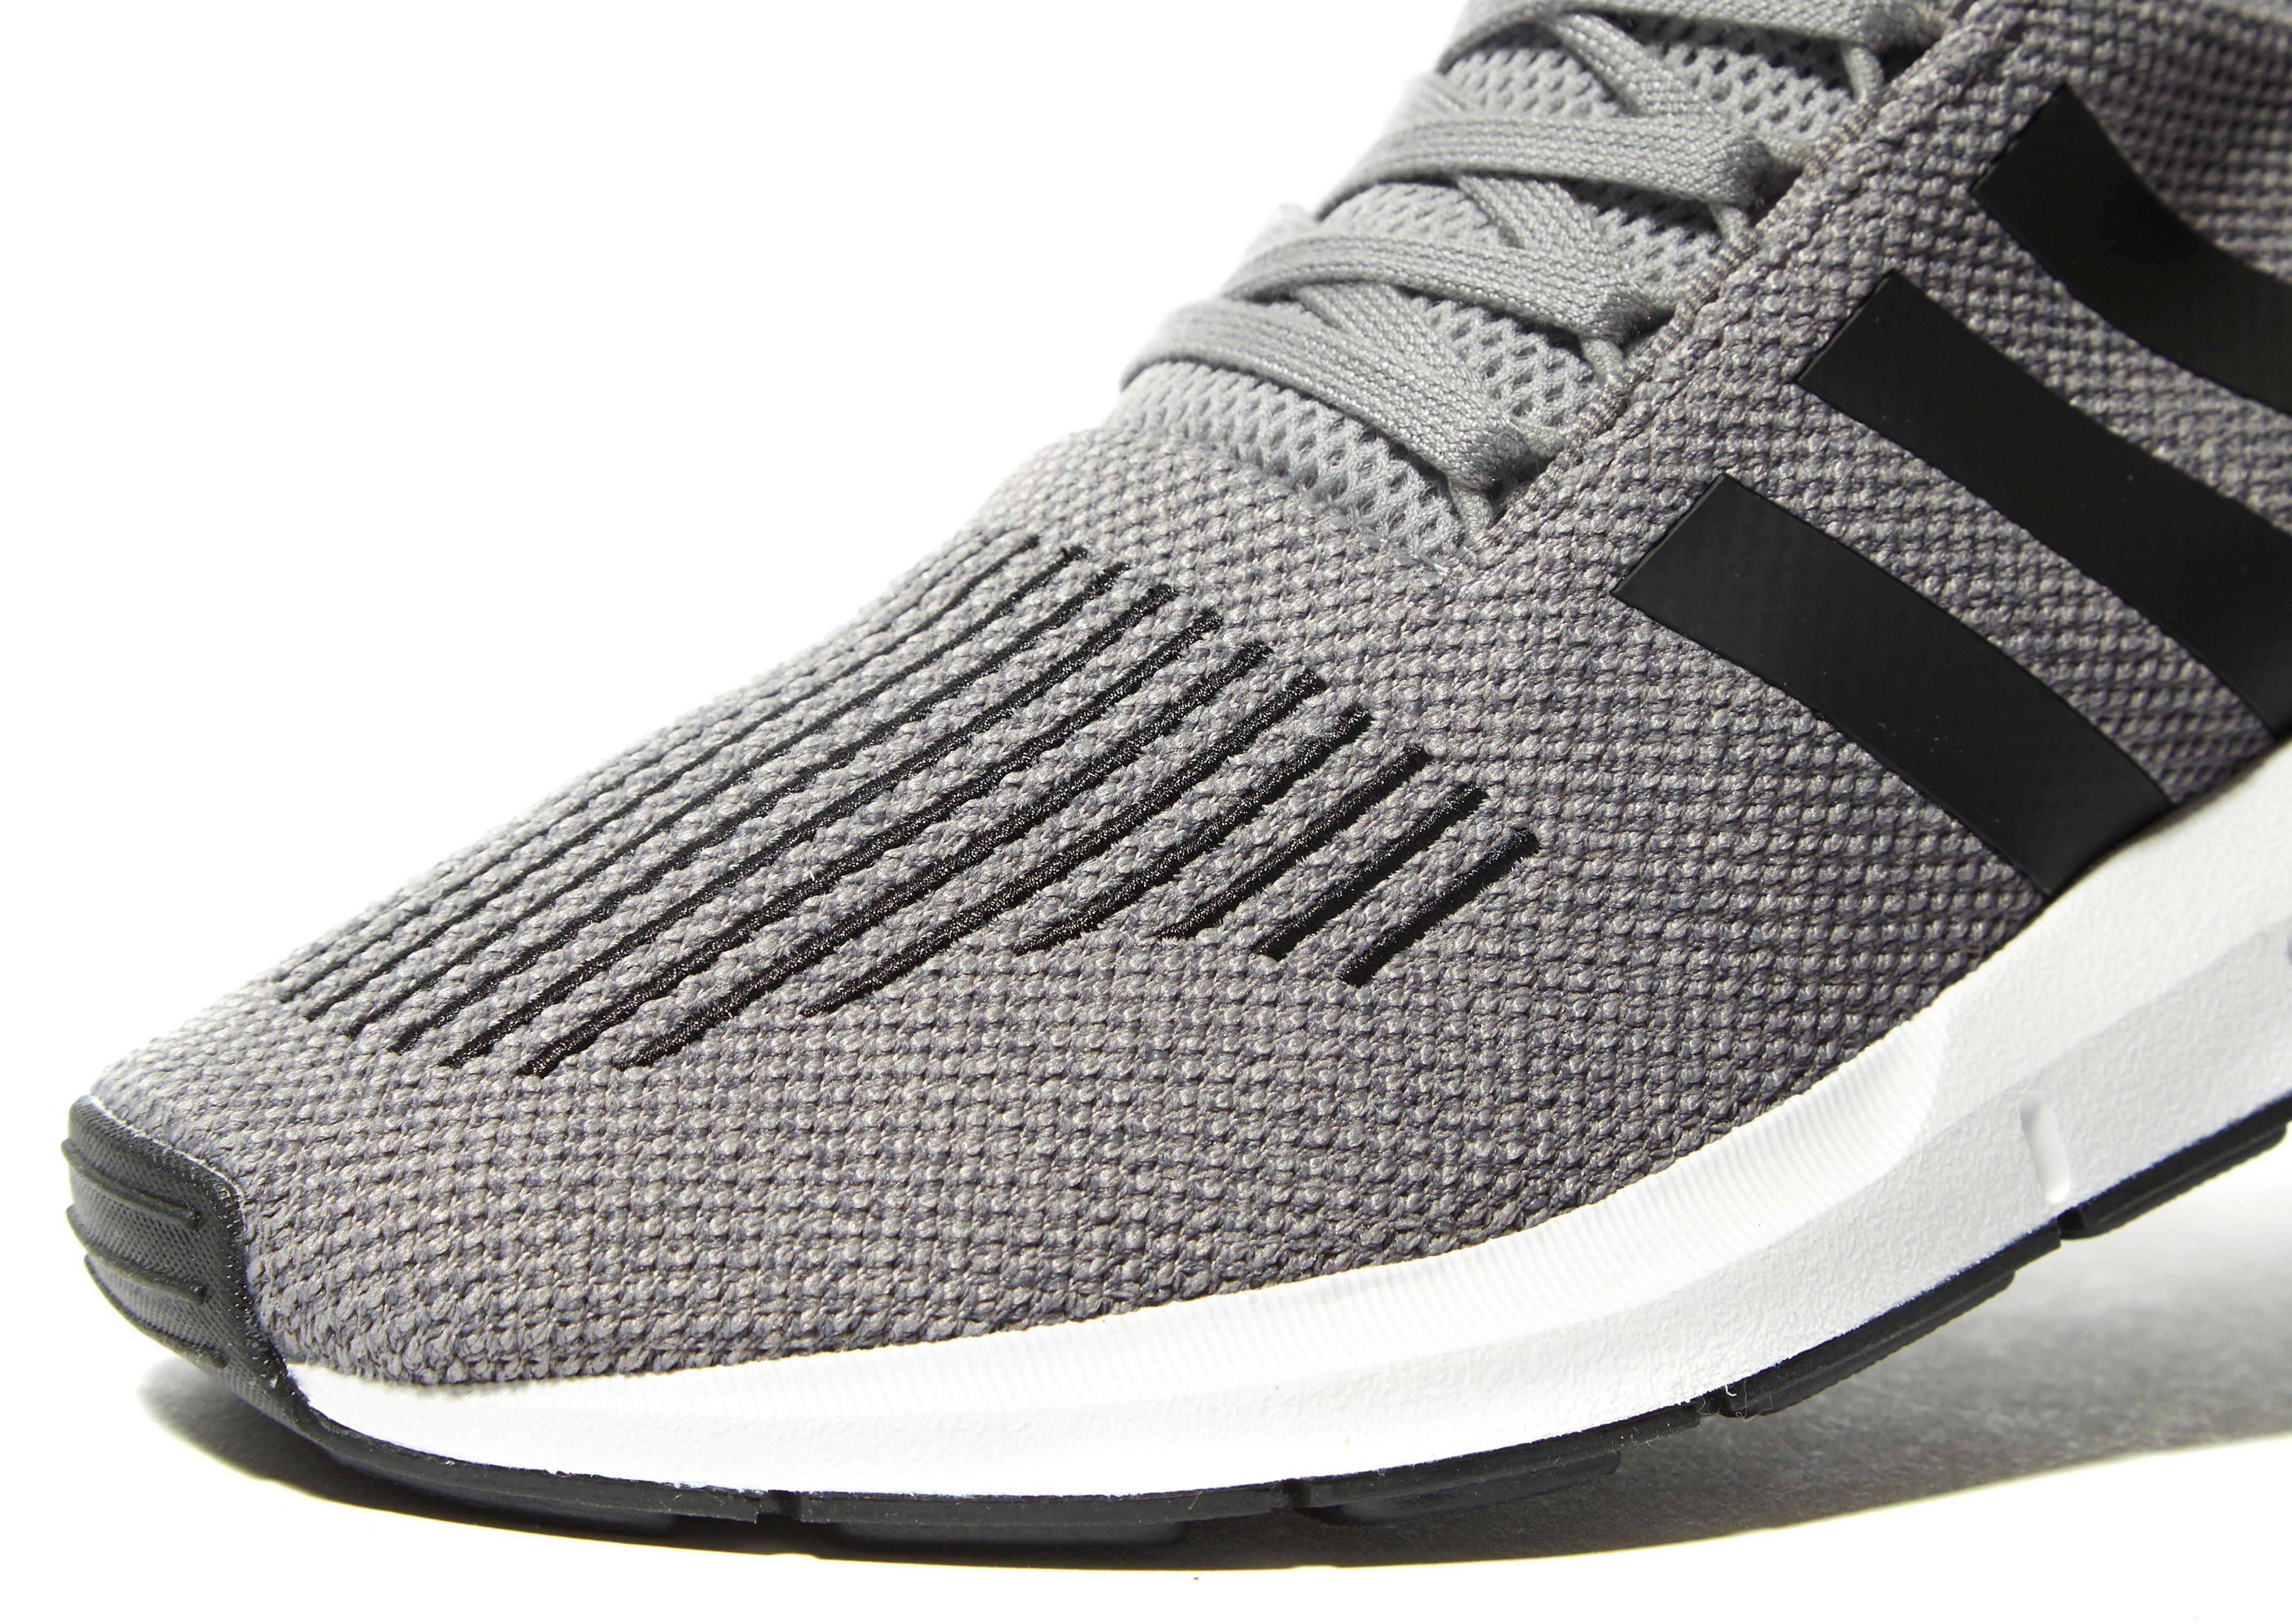 adidas Originals Synthetic Swift Run in Grey/Black/White (Grey) for Men